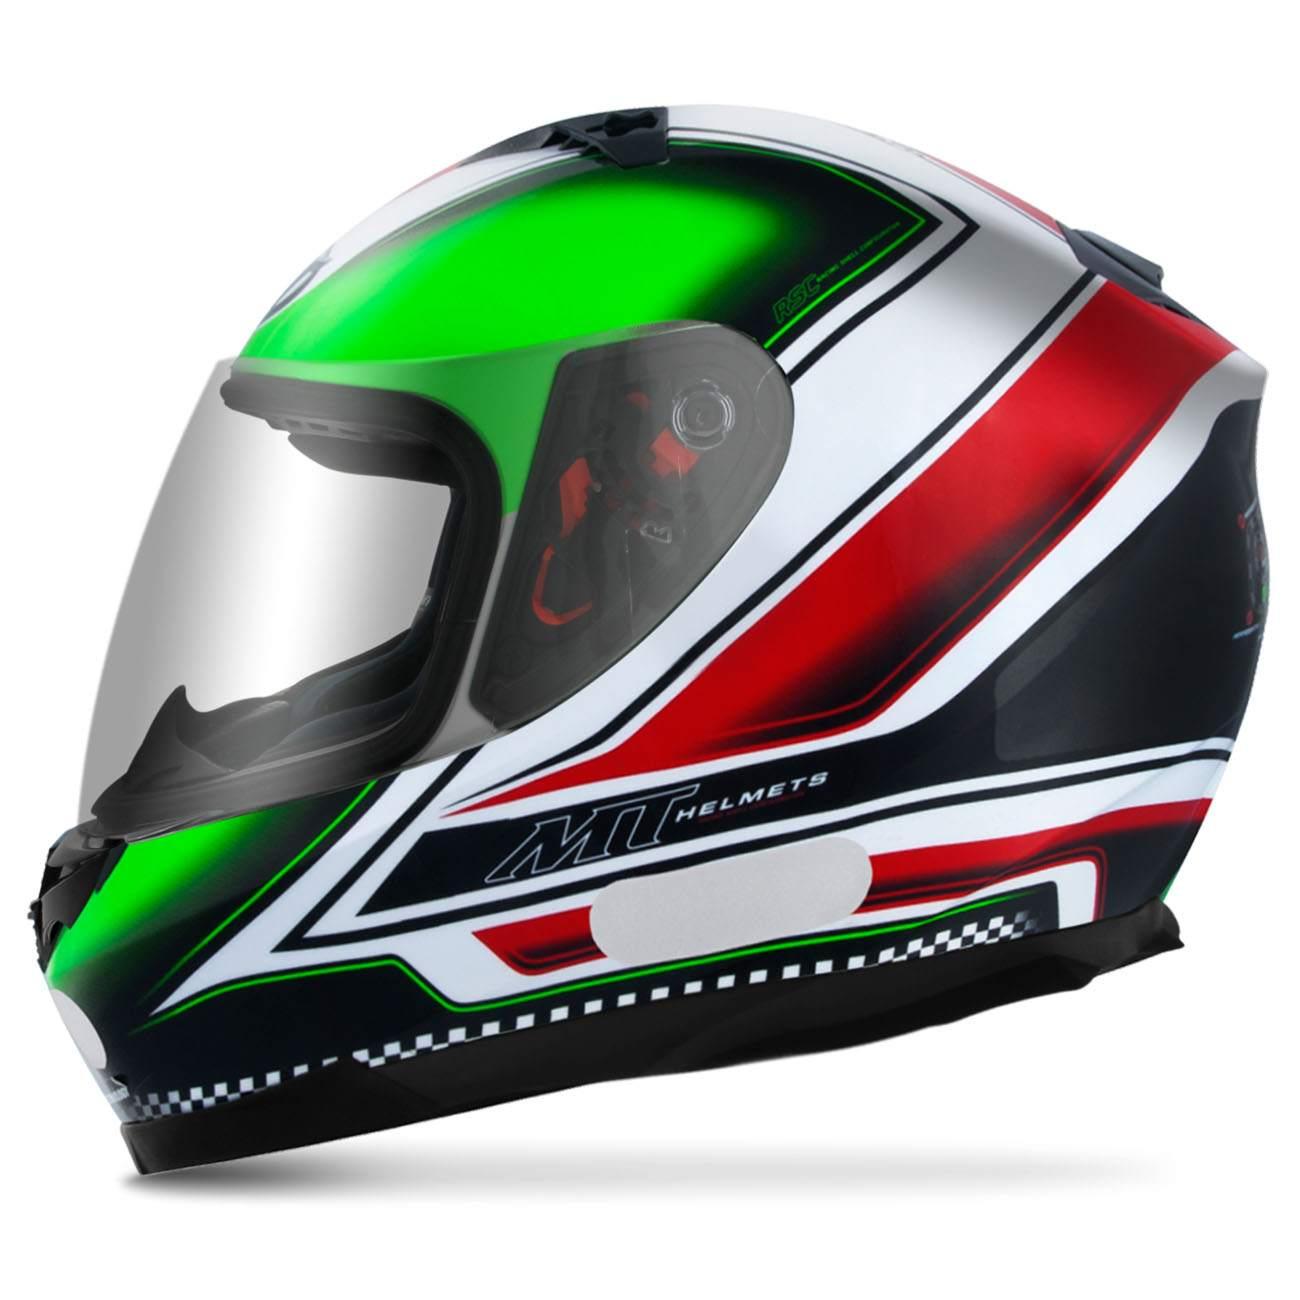 Capacete Fechado MT Helmets Blade Mugello Black Green Red White Preto Tamanho 58